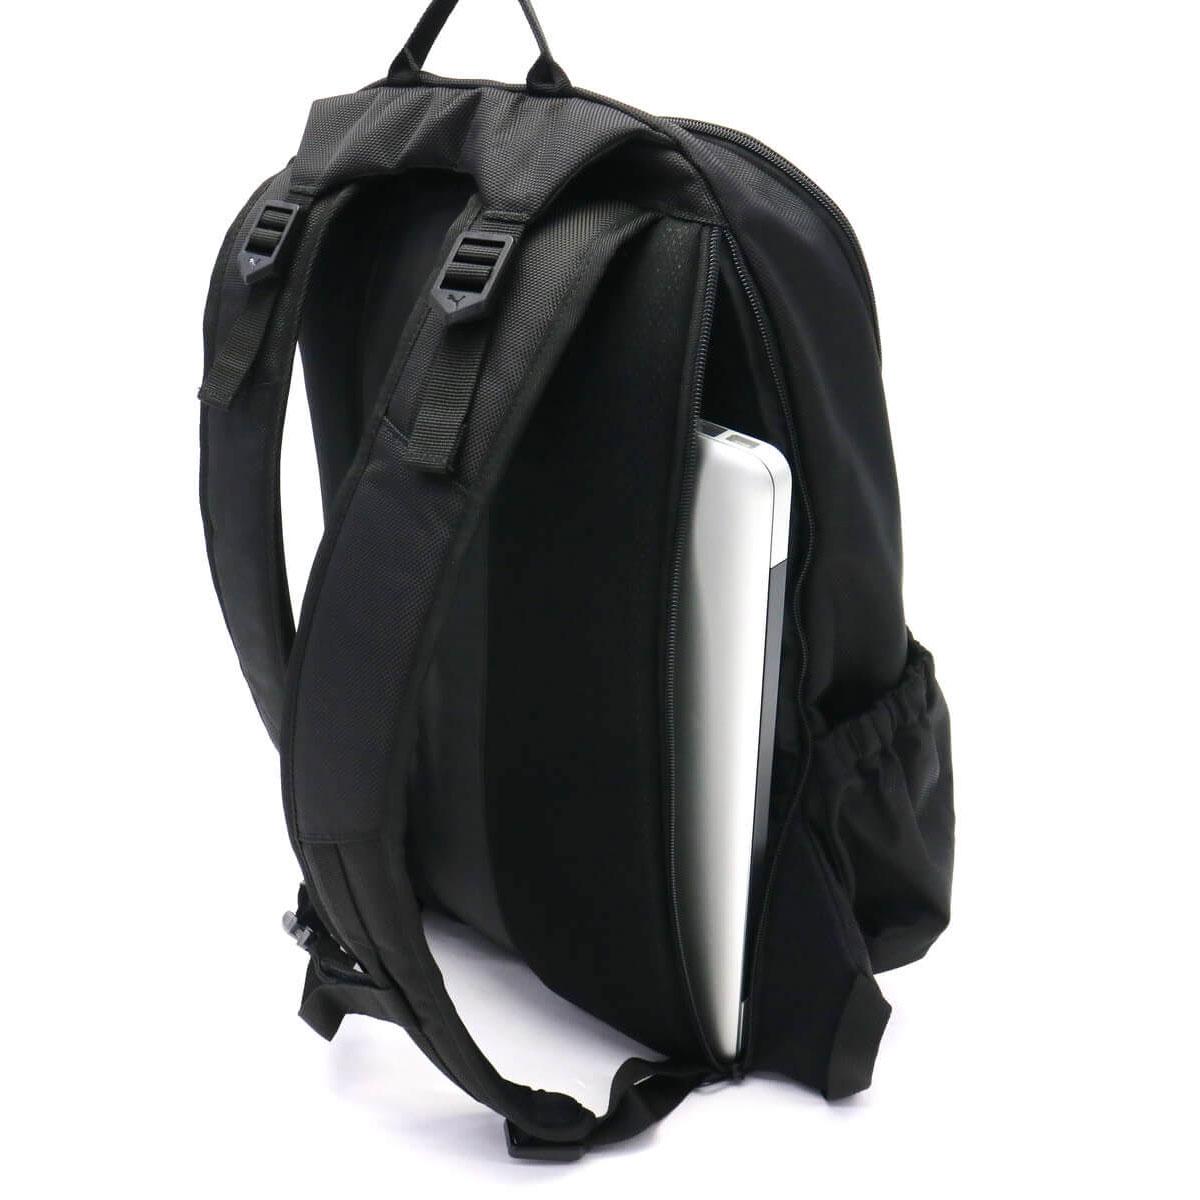 SALE 30% OFF  PUMA backpack rucksack mens womens A4 PCStorage commuting to  school Street Fashion 075450 23d1316a028db